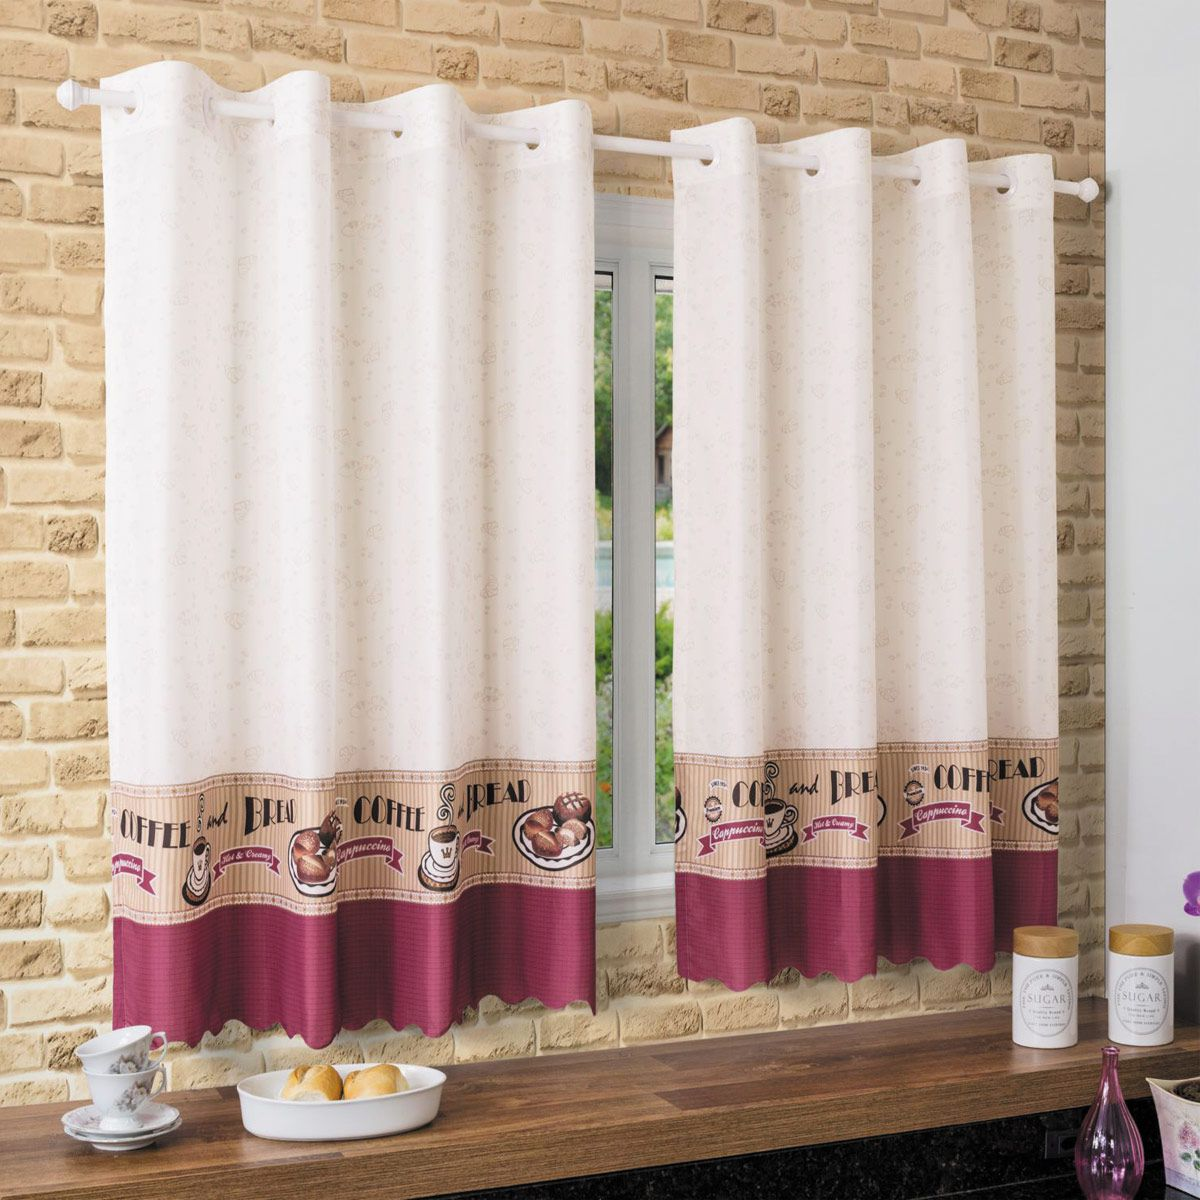 Cortina De Cozinha Allegra Bread 2,60 x 1,20 Bella Janela